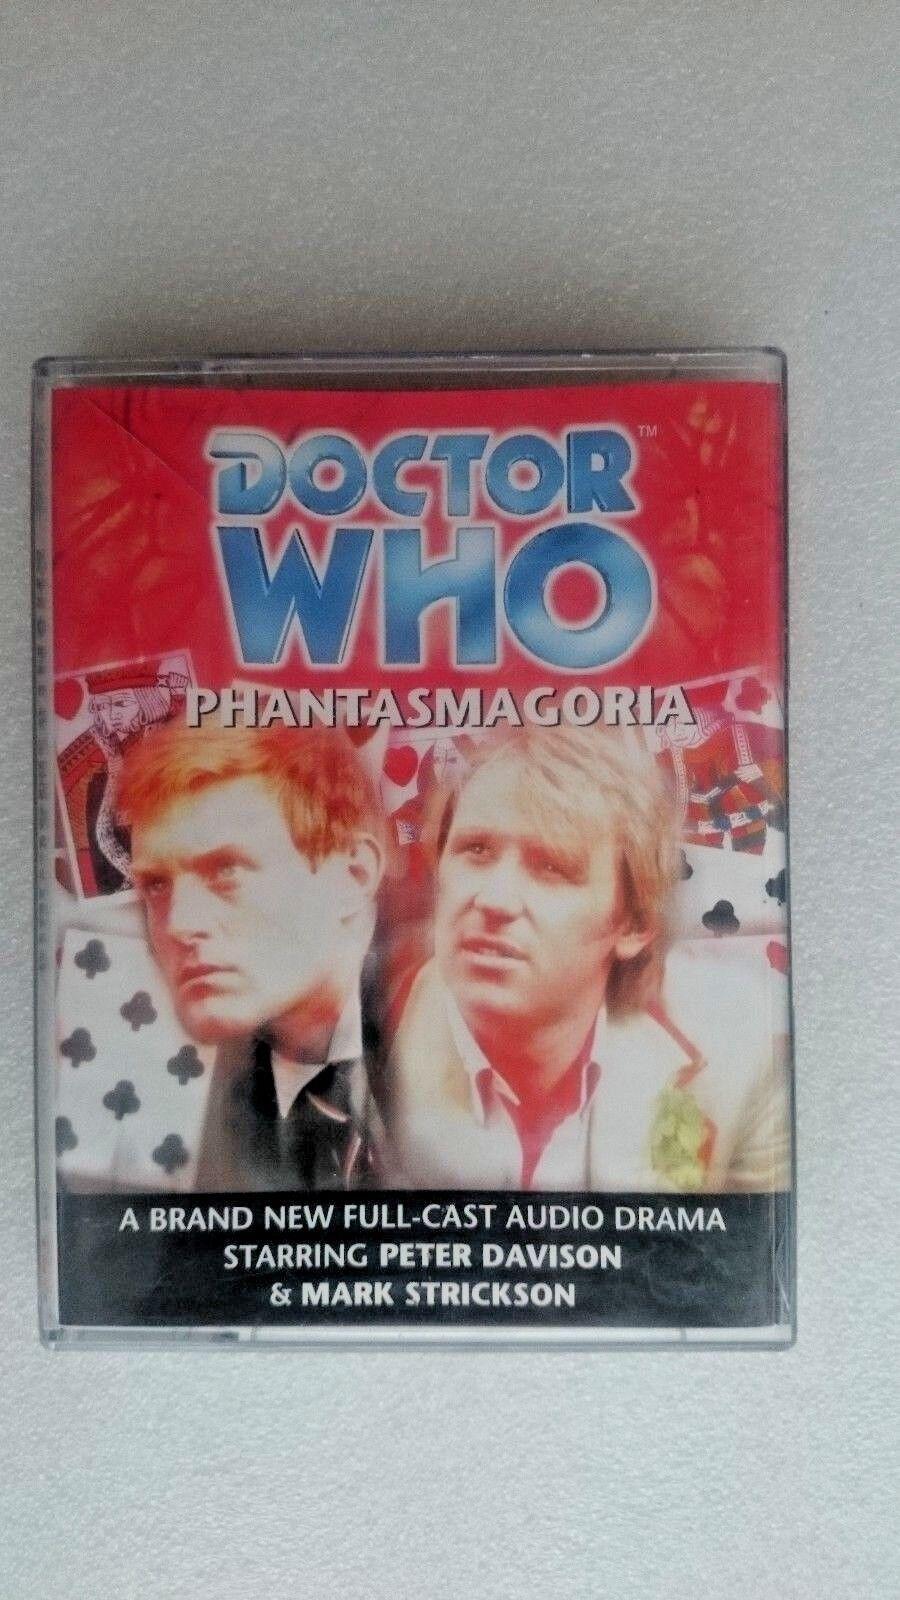 Doctor Who Phantasmagoria  (Audio Soundtrack) - Peter Davidson